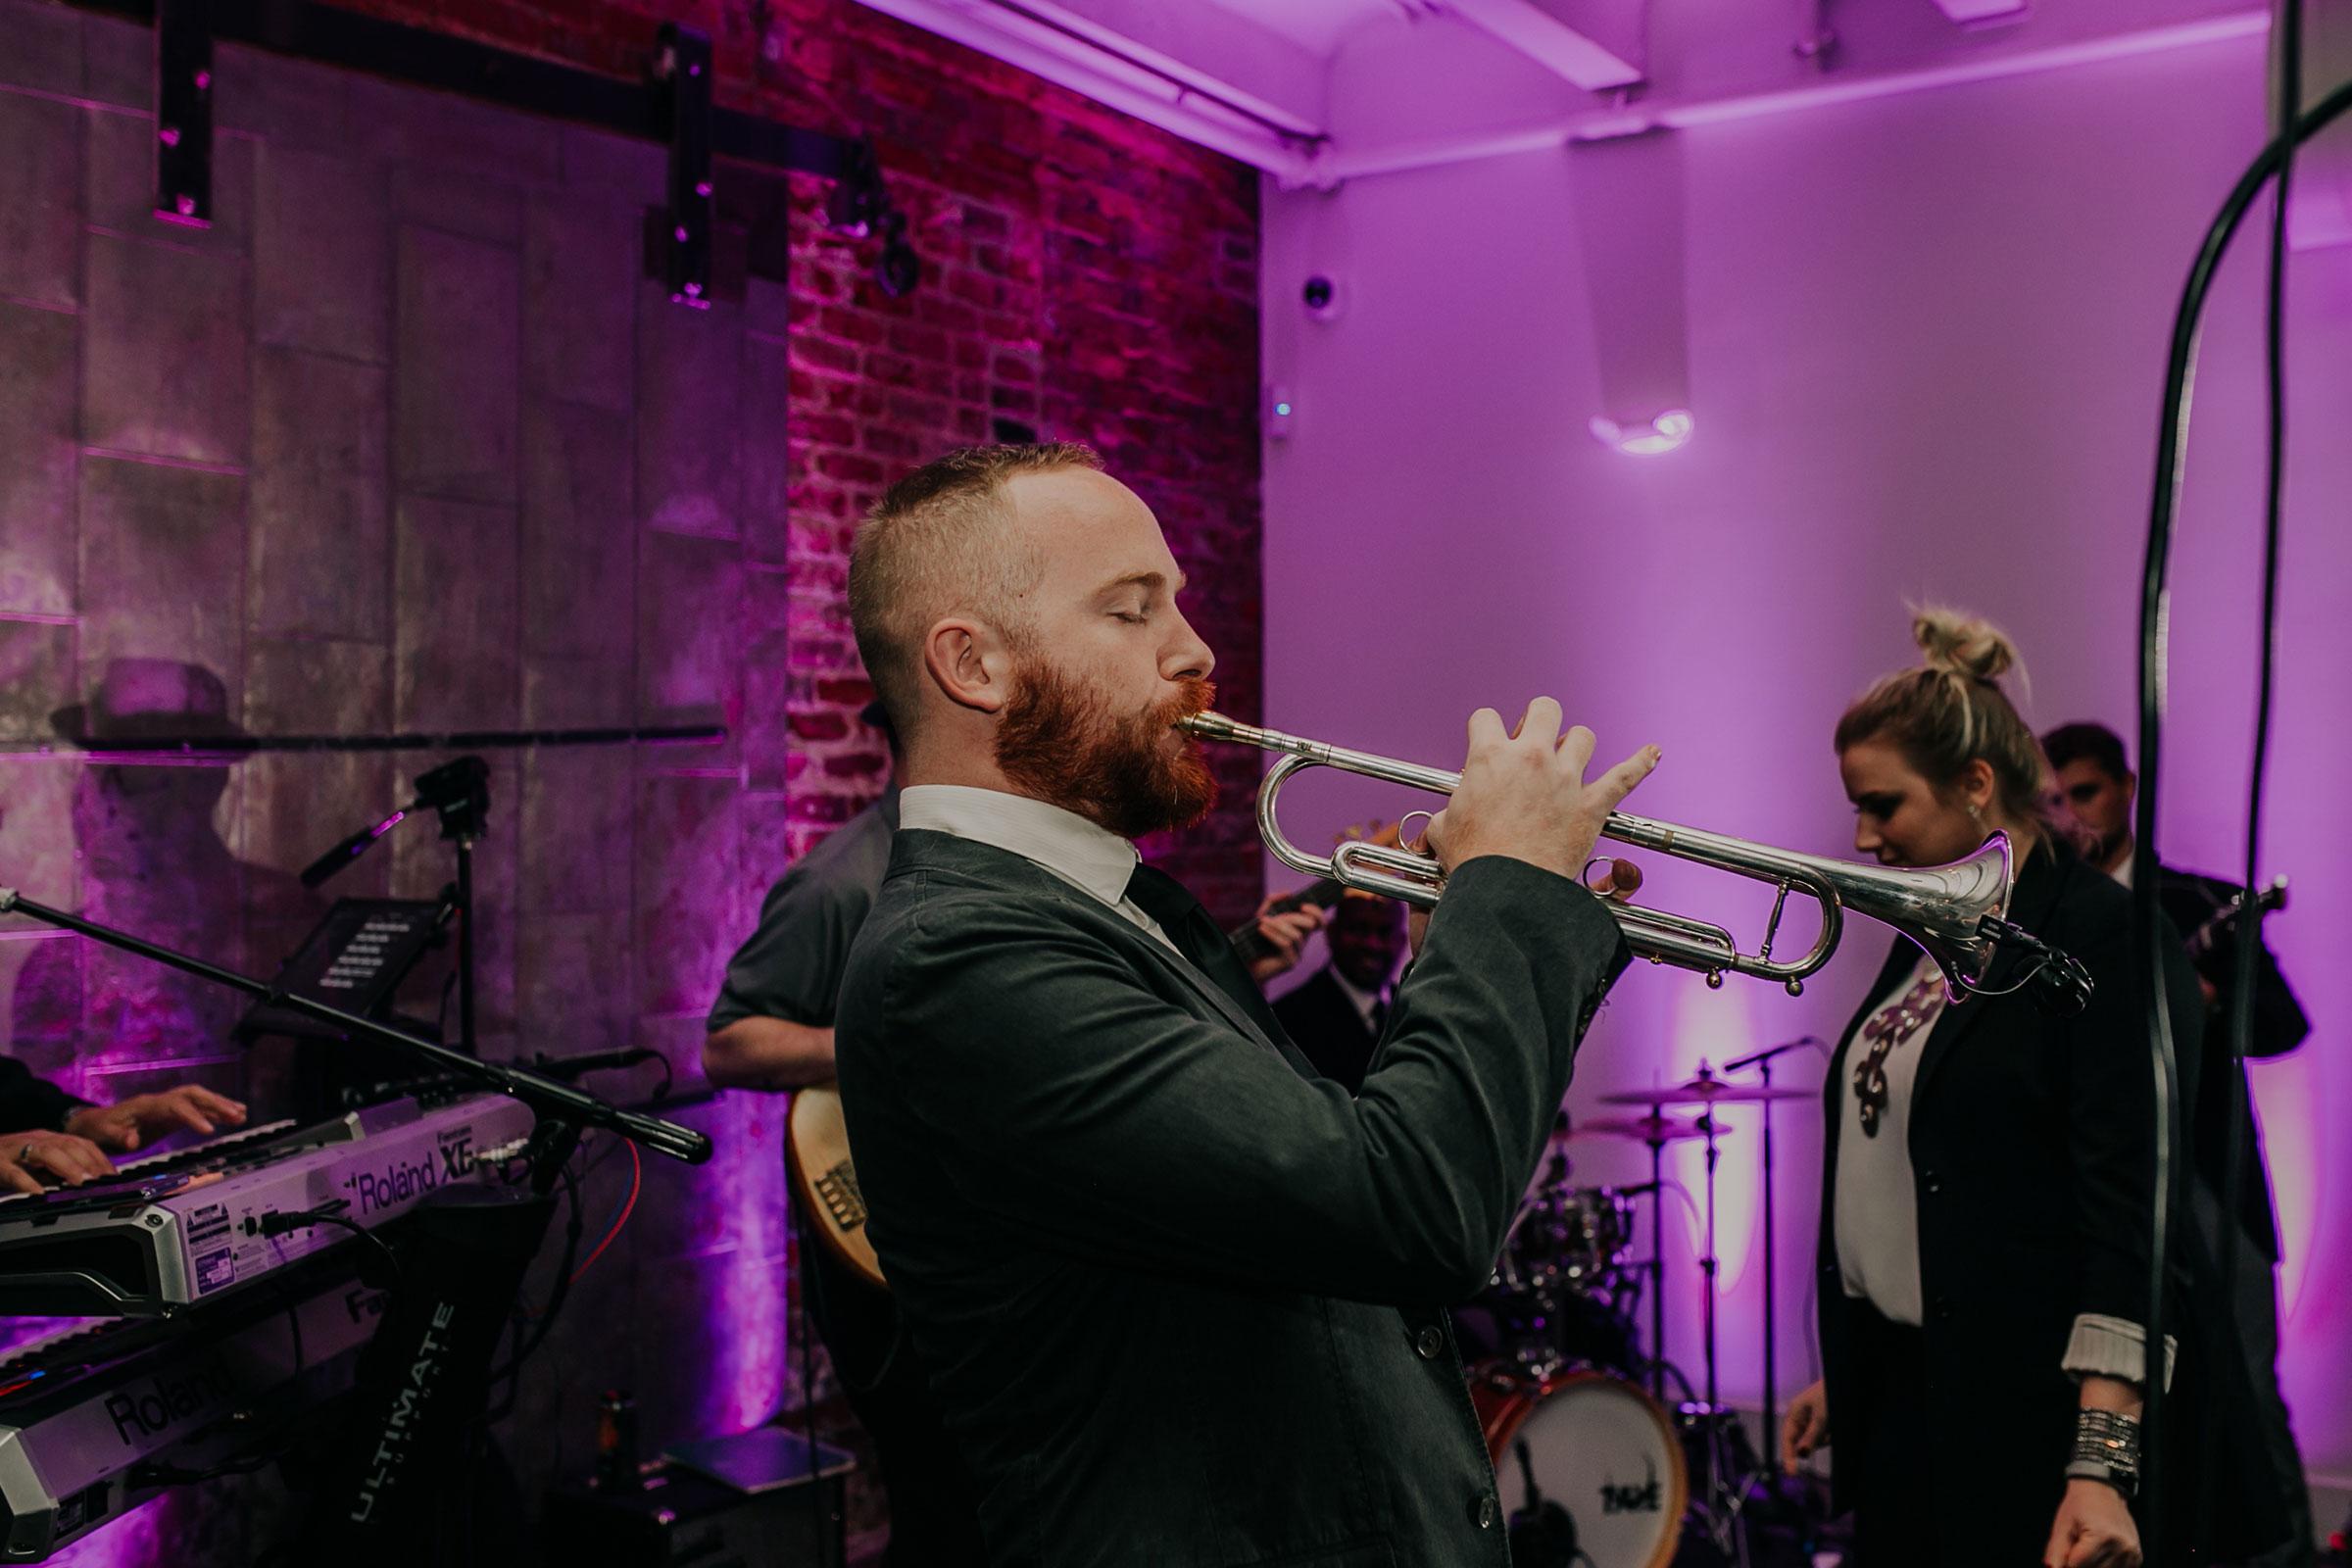 diamond-empire-band-playing-trumpet-founders-one-nine-omaha-nebraska-raelyn-ramey-photography.jpg